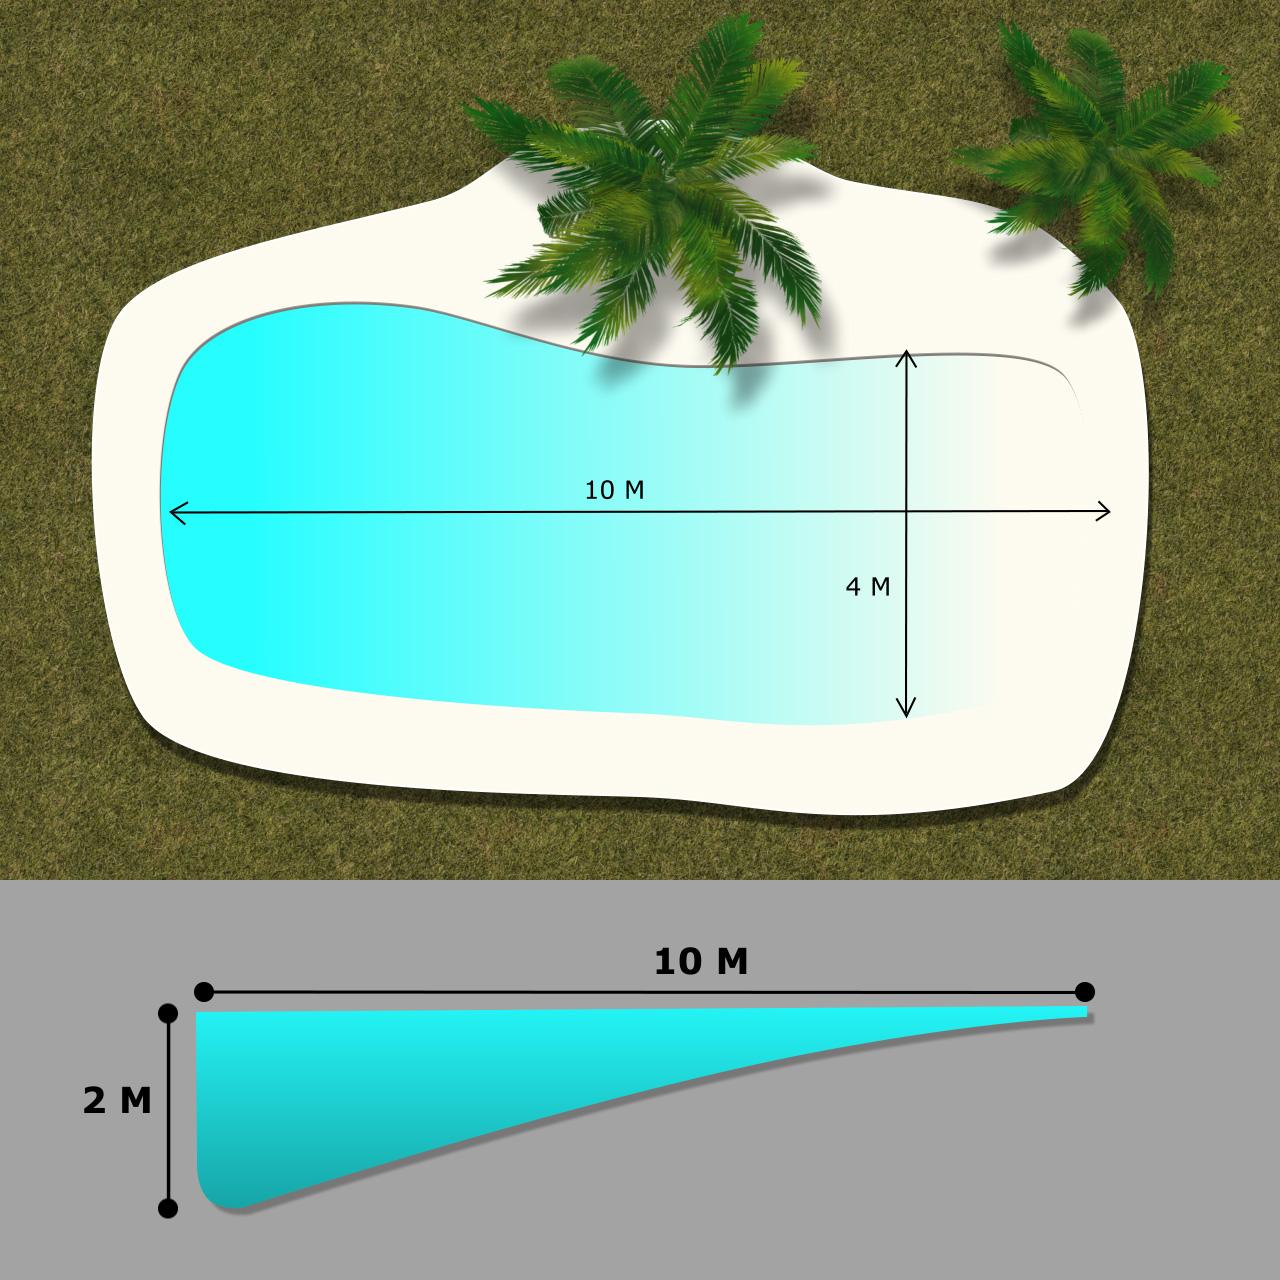 Piscina de arena - Imagenes de piscinas de arena ...